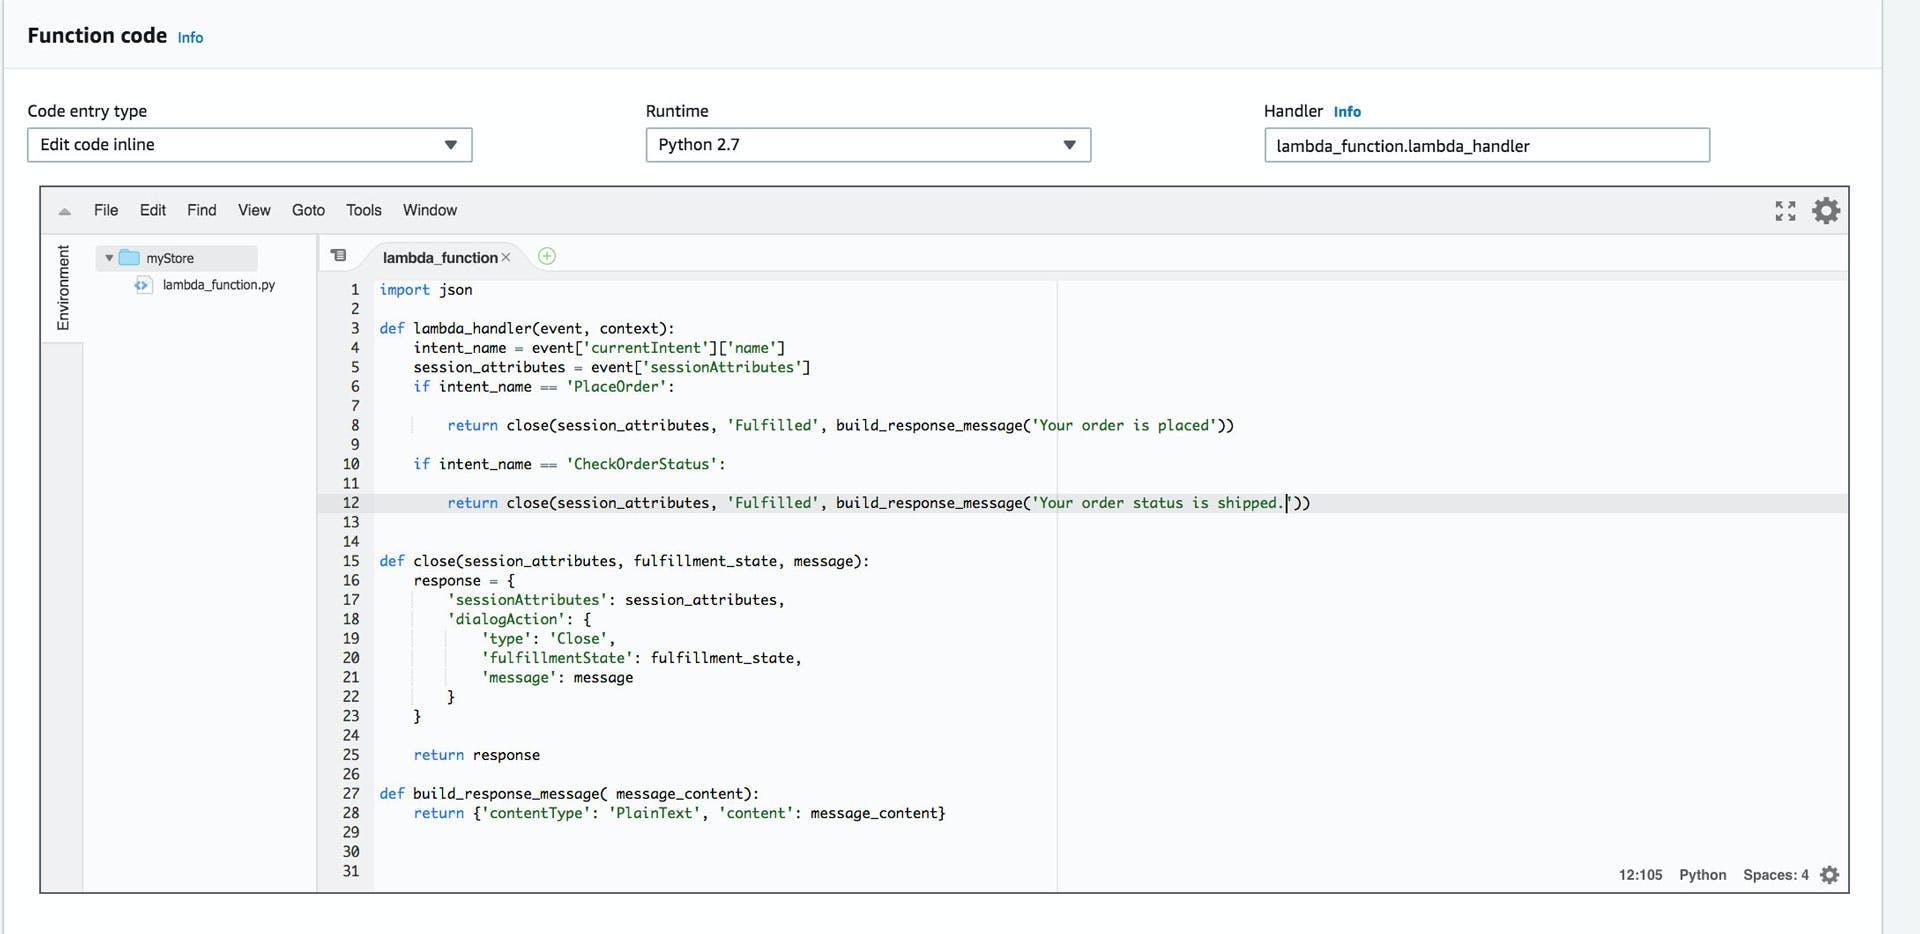 Lambda function code inline